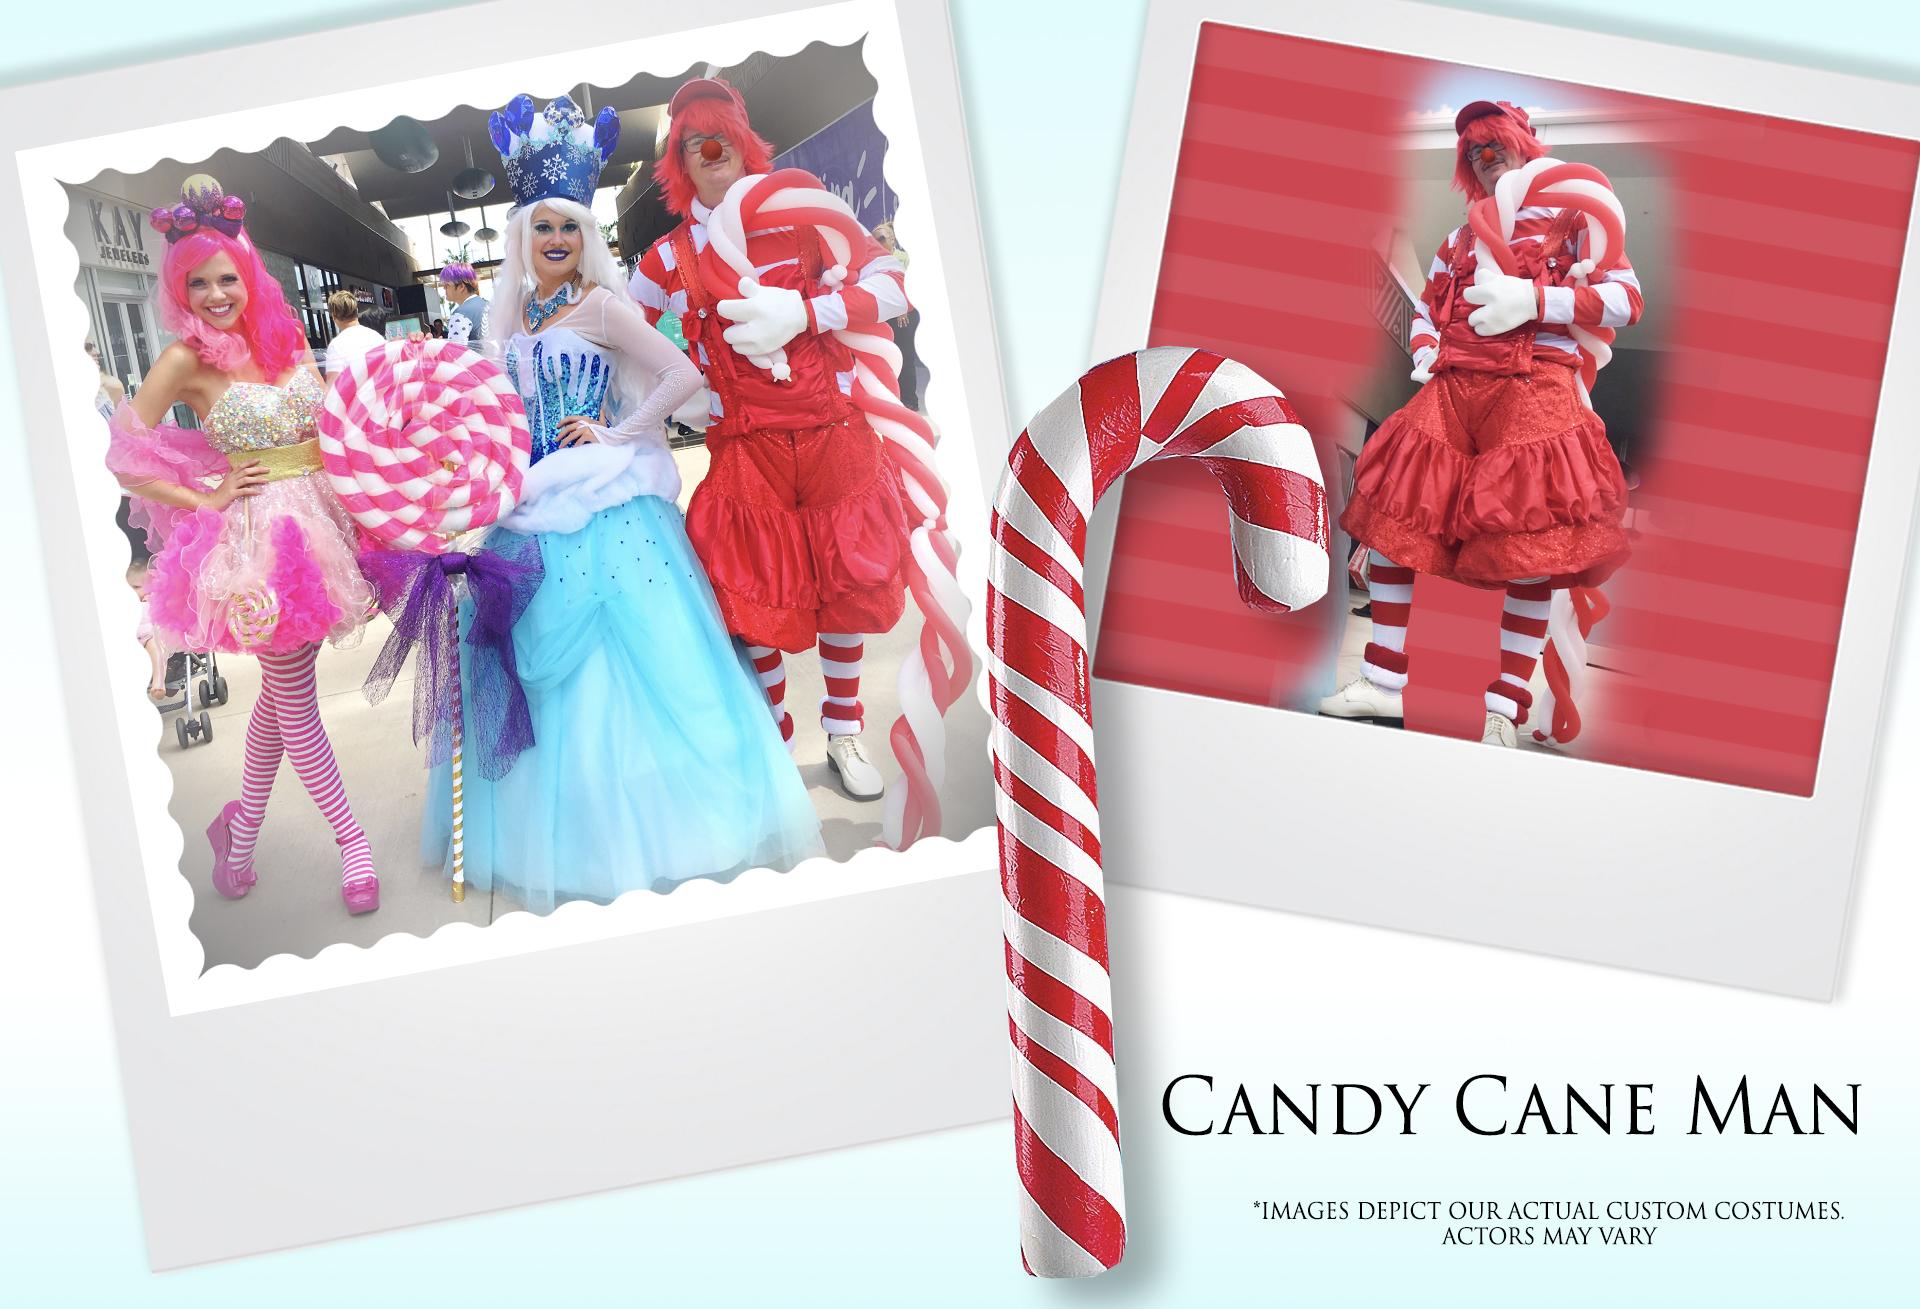 Candy Cane Man